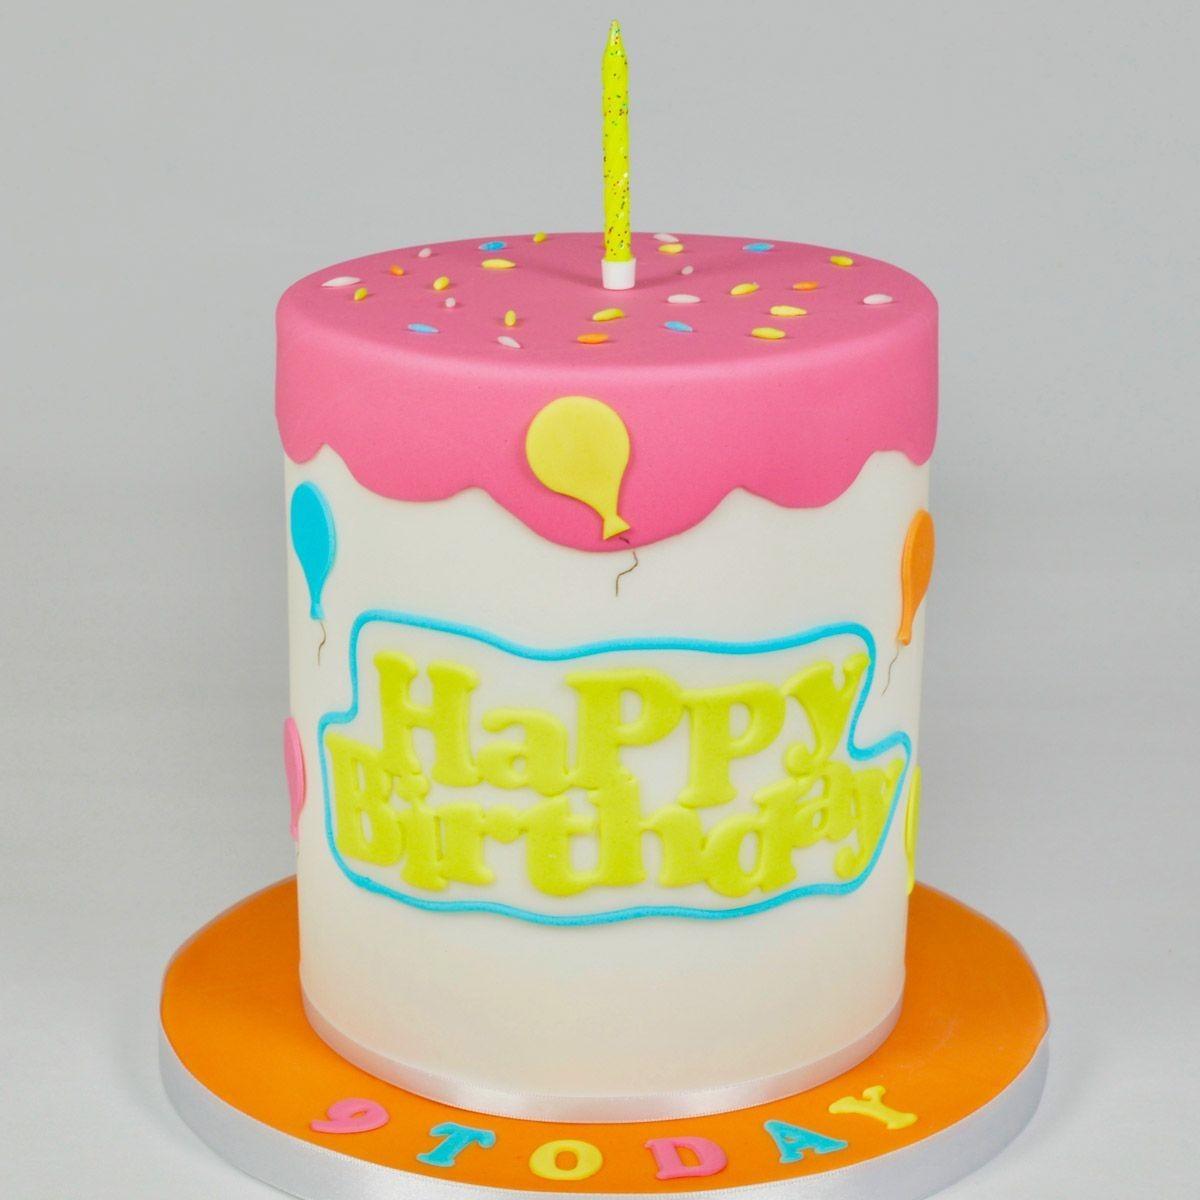 SALE!!! FMM Curved Words Cutter 'Happy Birthday' Cutter - Κουπ πατ 'Happy Birthday'